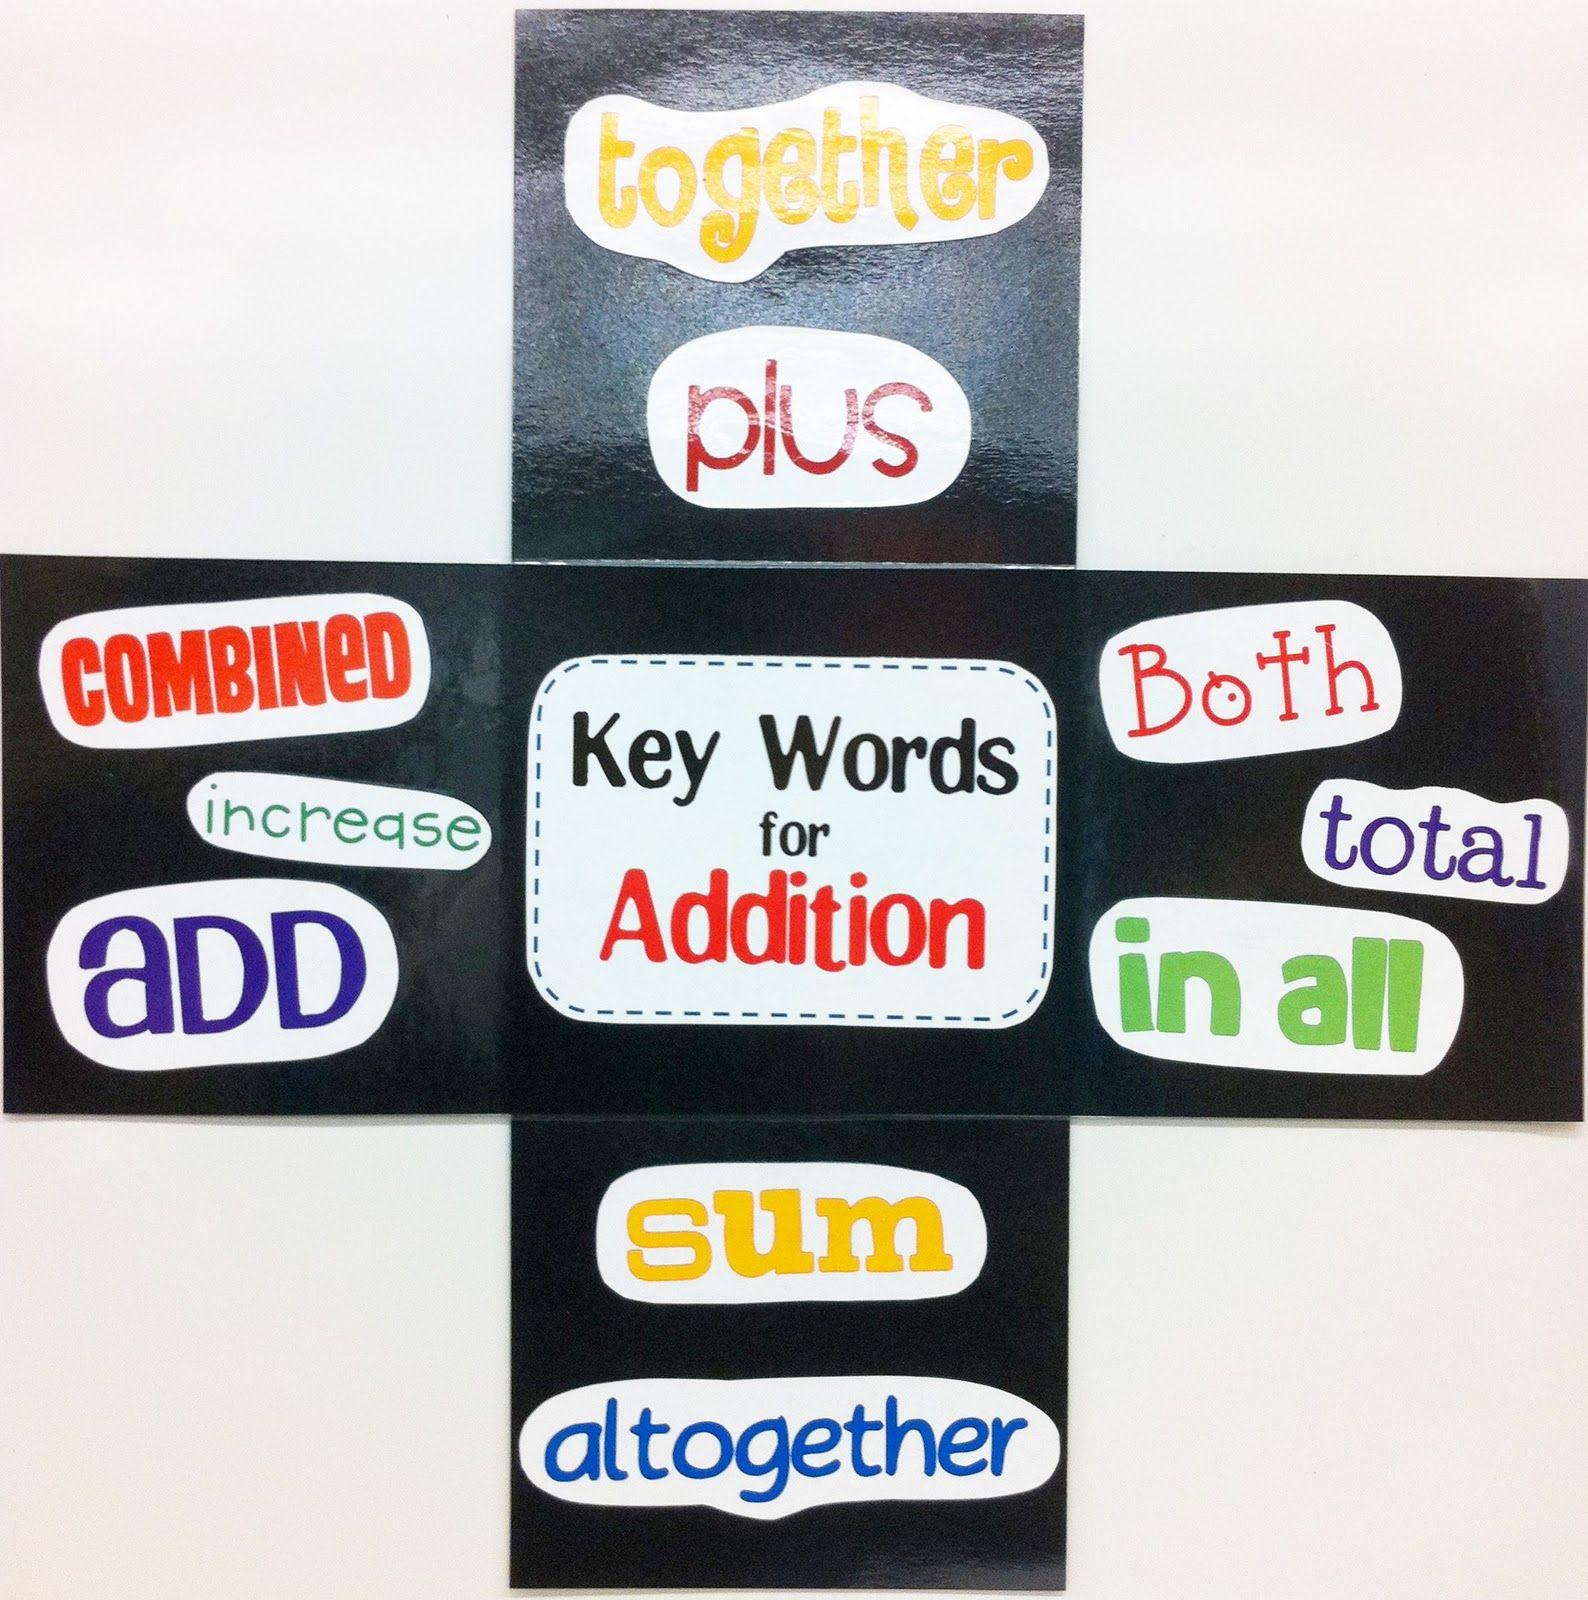 Key Words For Addition Math Addition Addition Words Education Math What other words mean addition